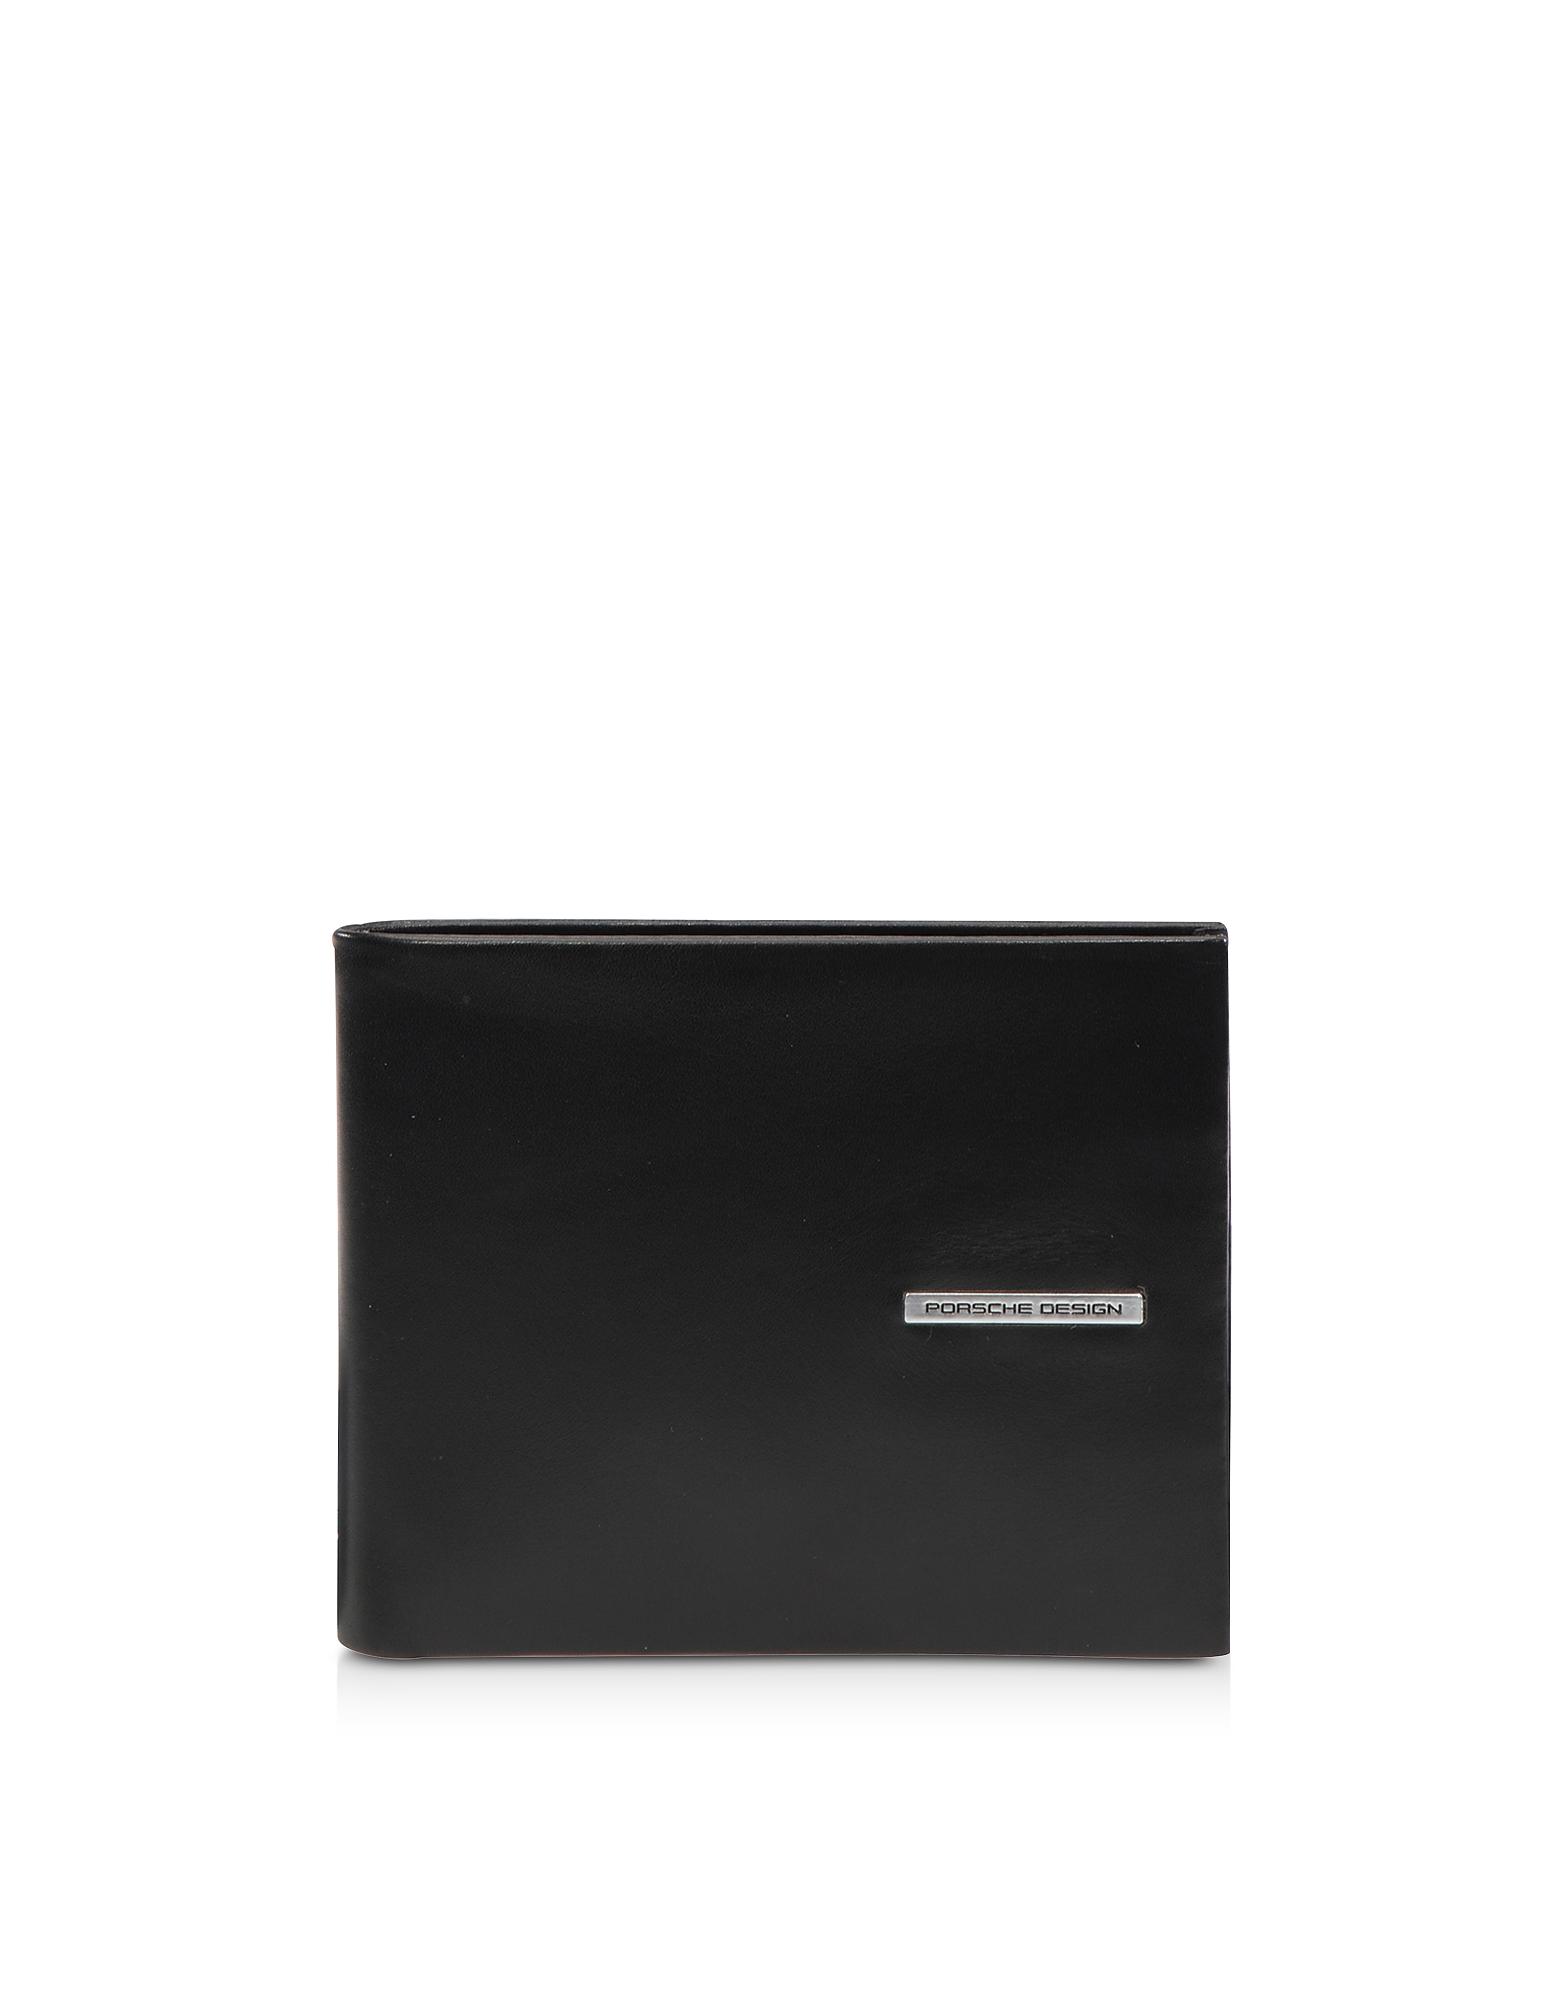 cl2 3.0 Billfold h10 1 Men's Wallet, Black